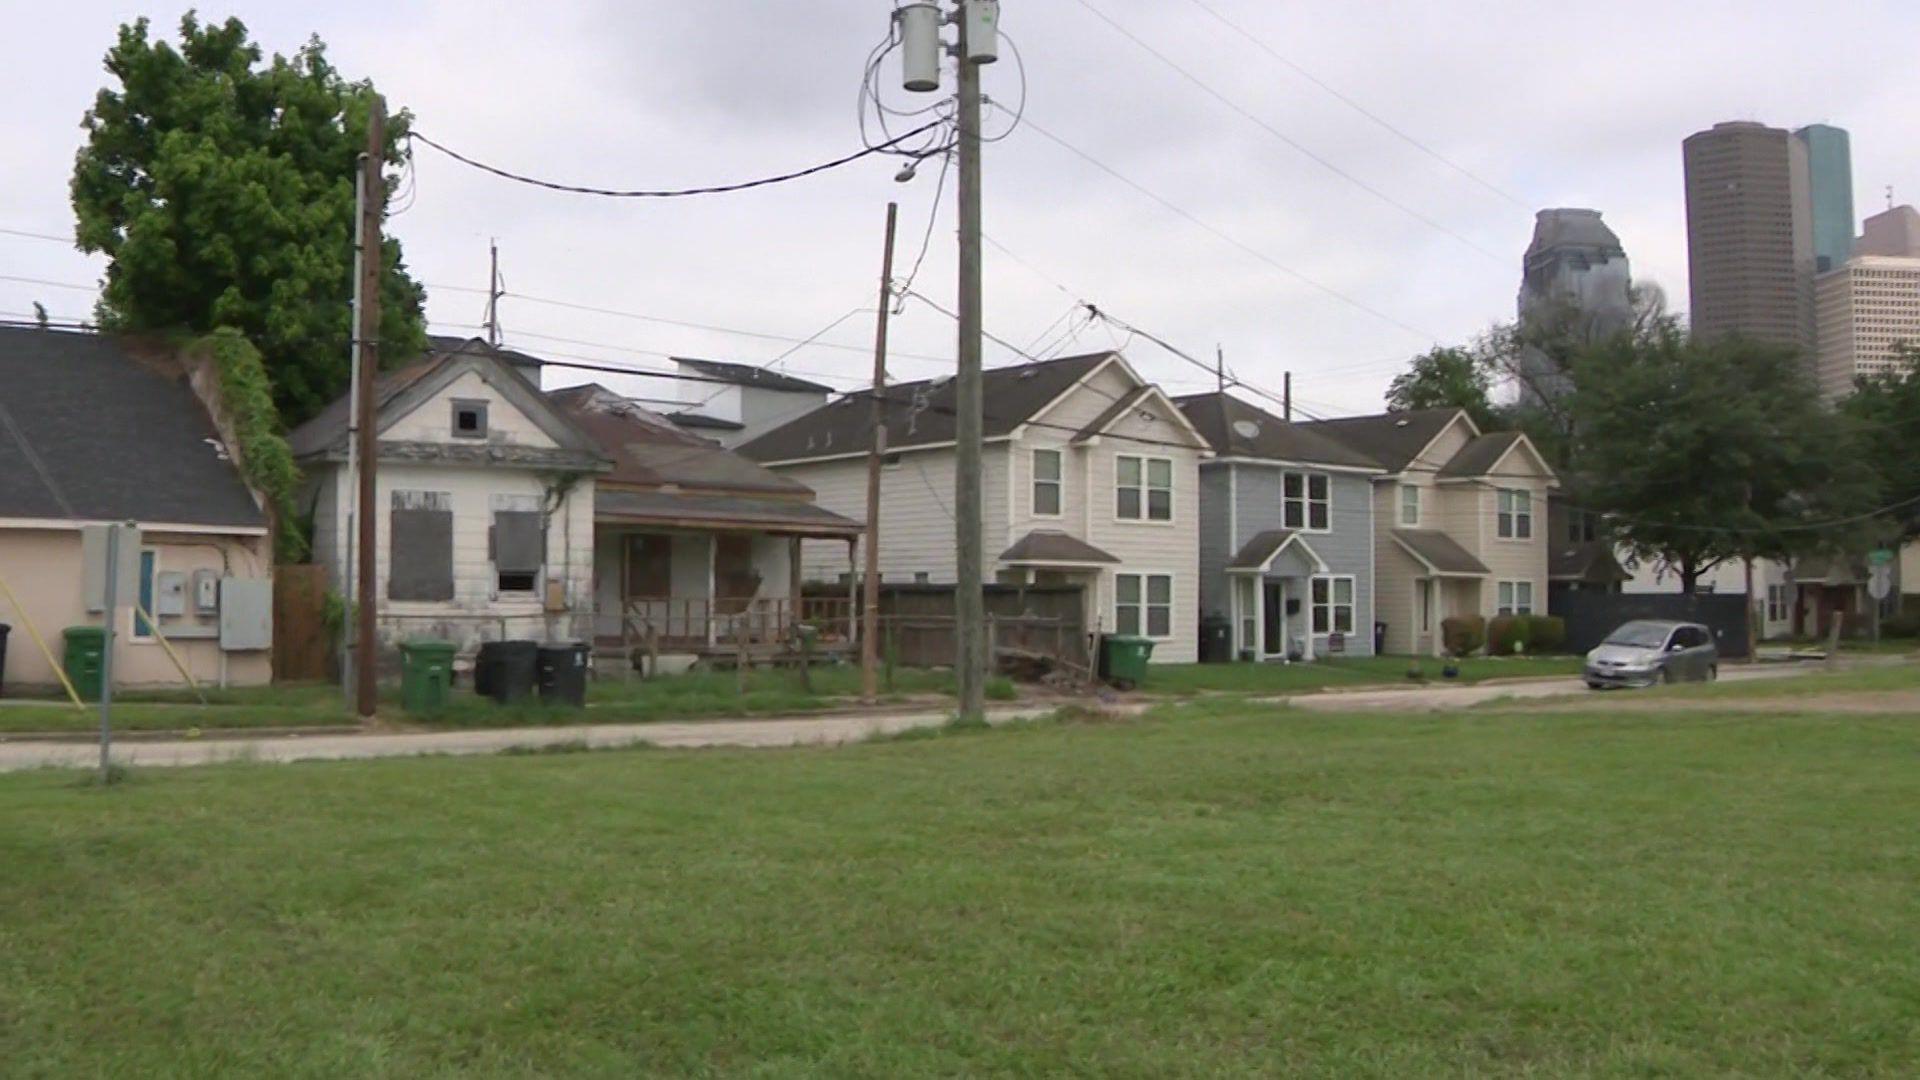 Houston Starts Major Efforts to Restore and Preserve City's Oldest Black Community